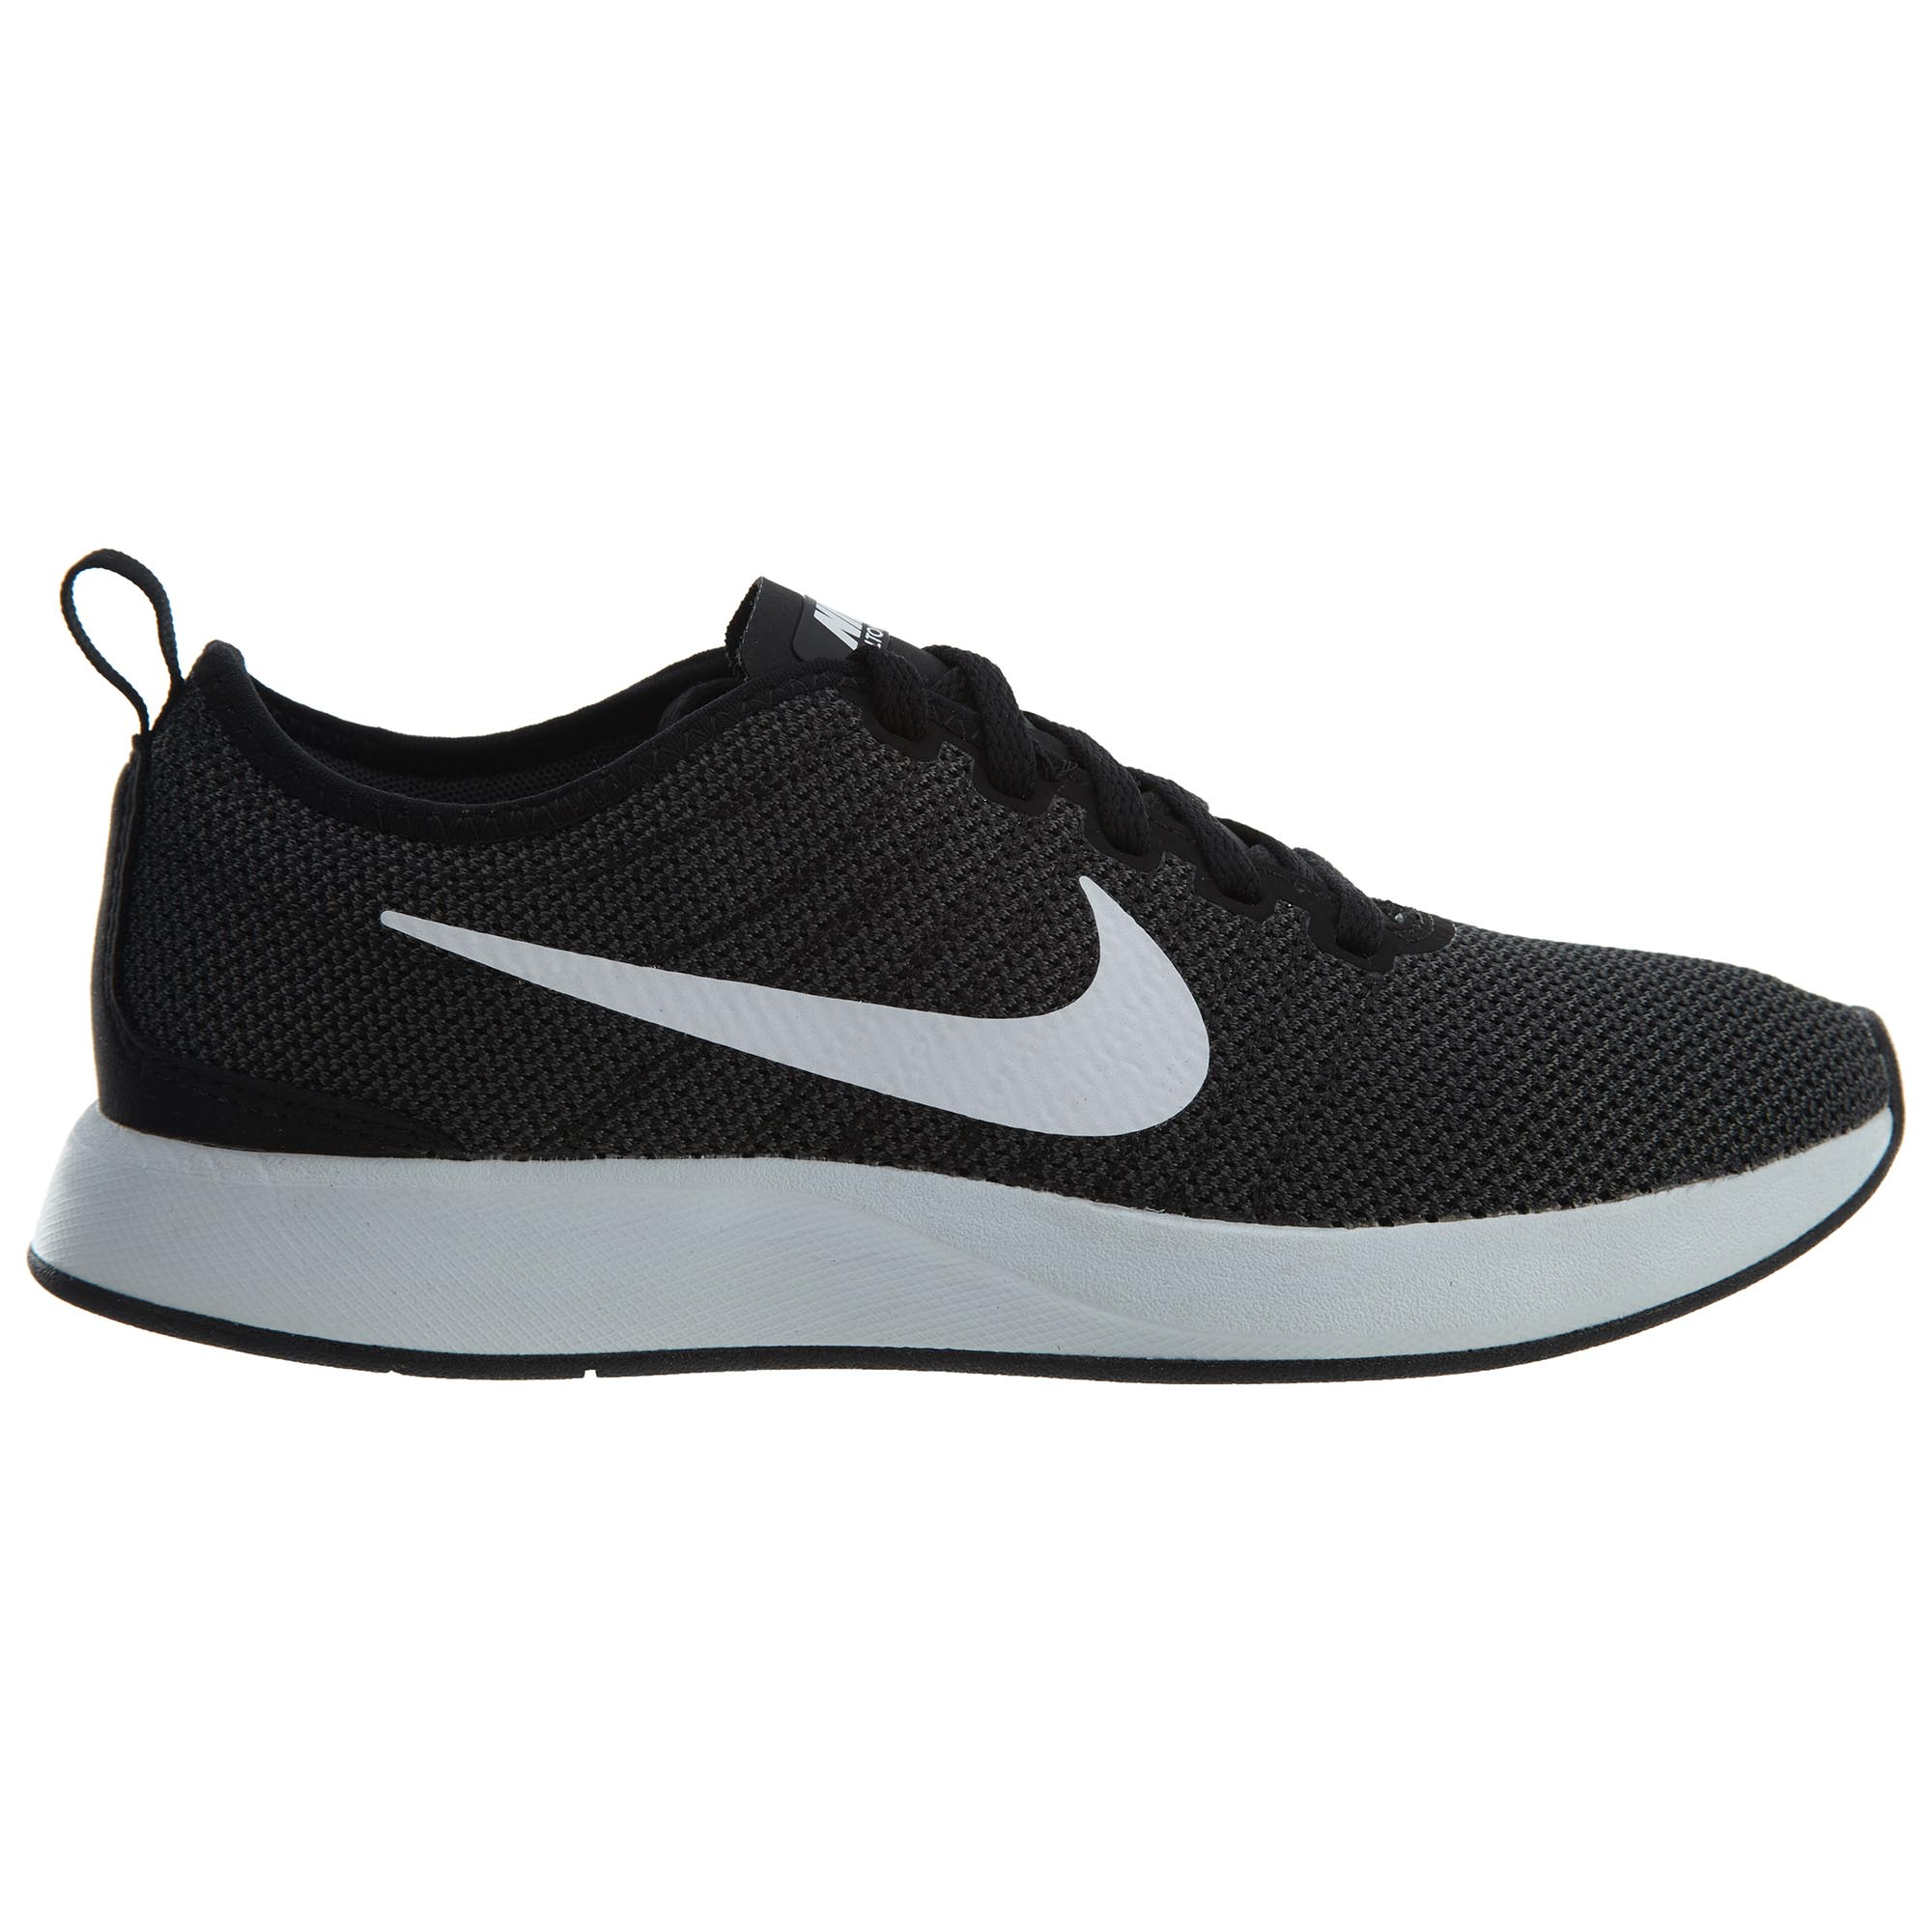 Nike Dualtone Racer Black White-Dark